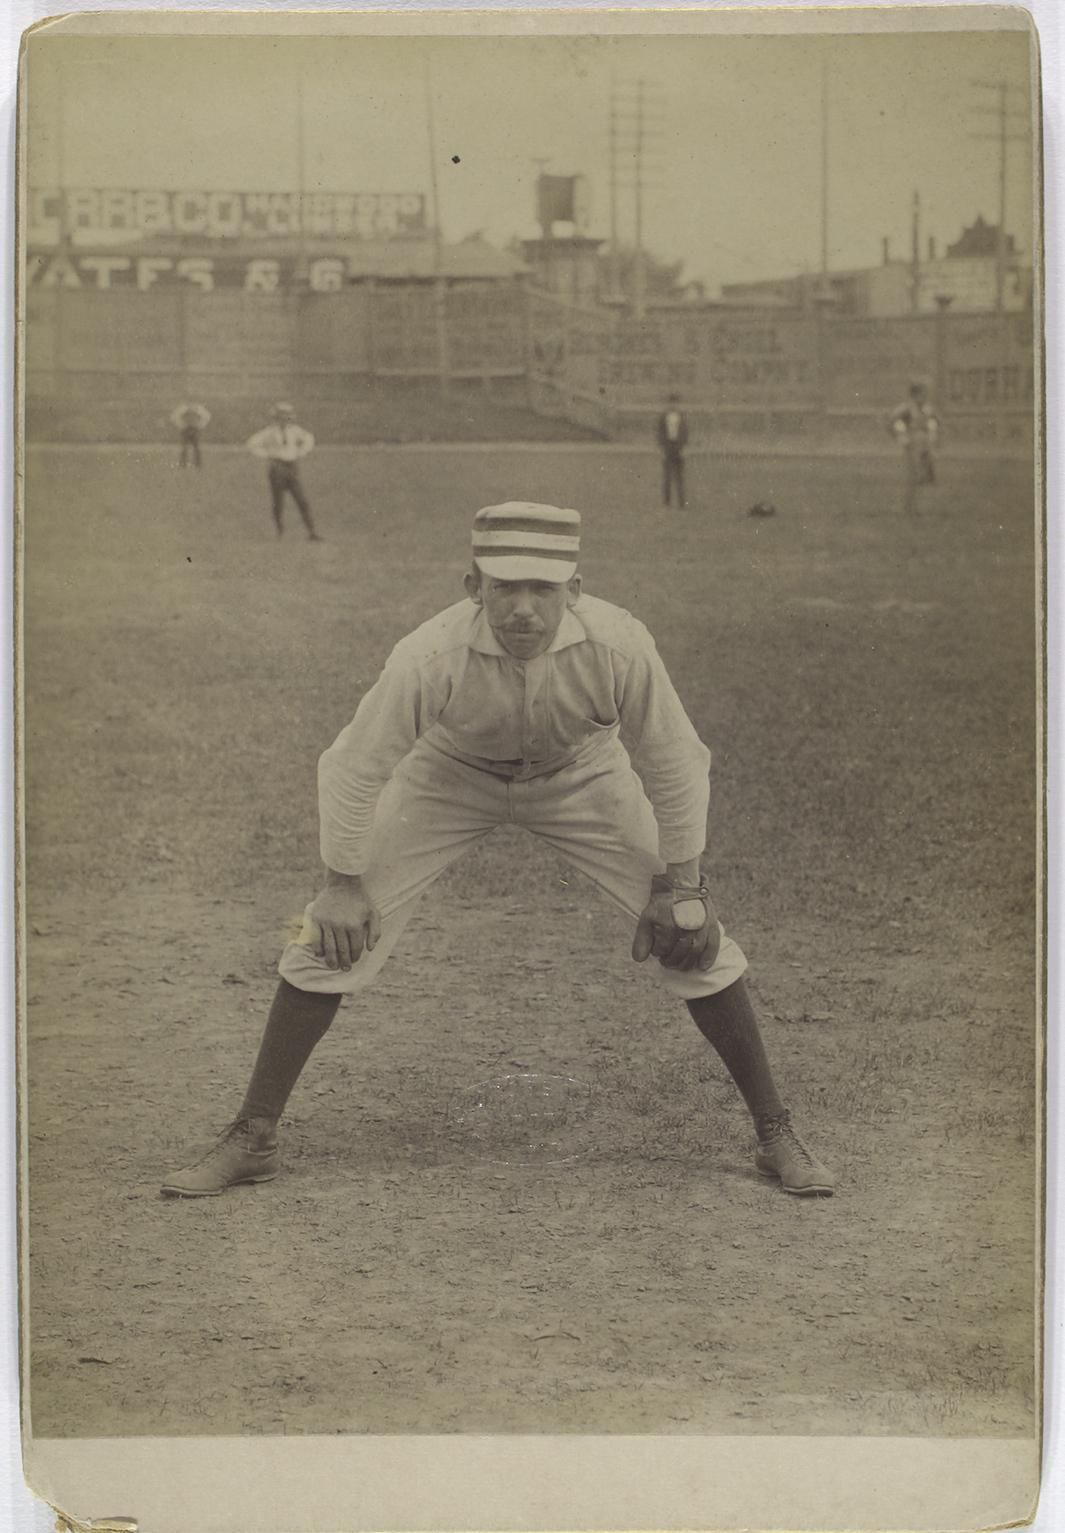 Pin on 19th Century Baseball